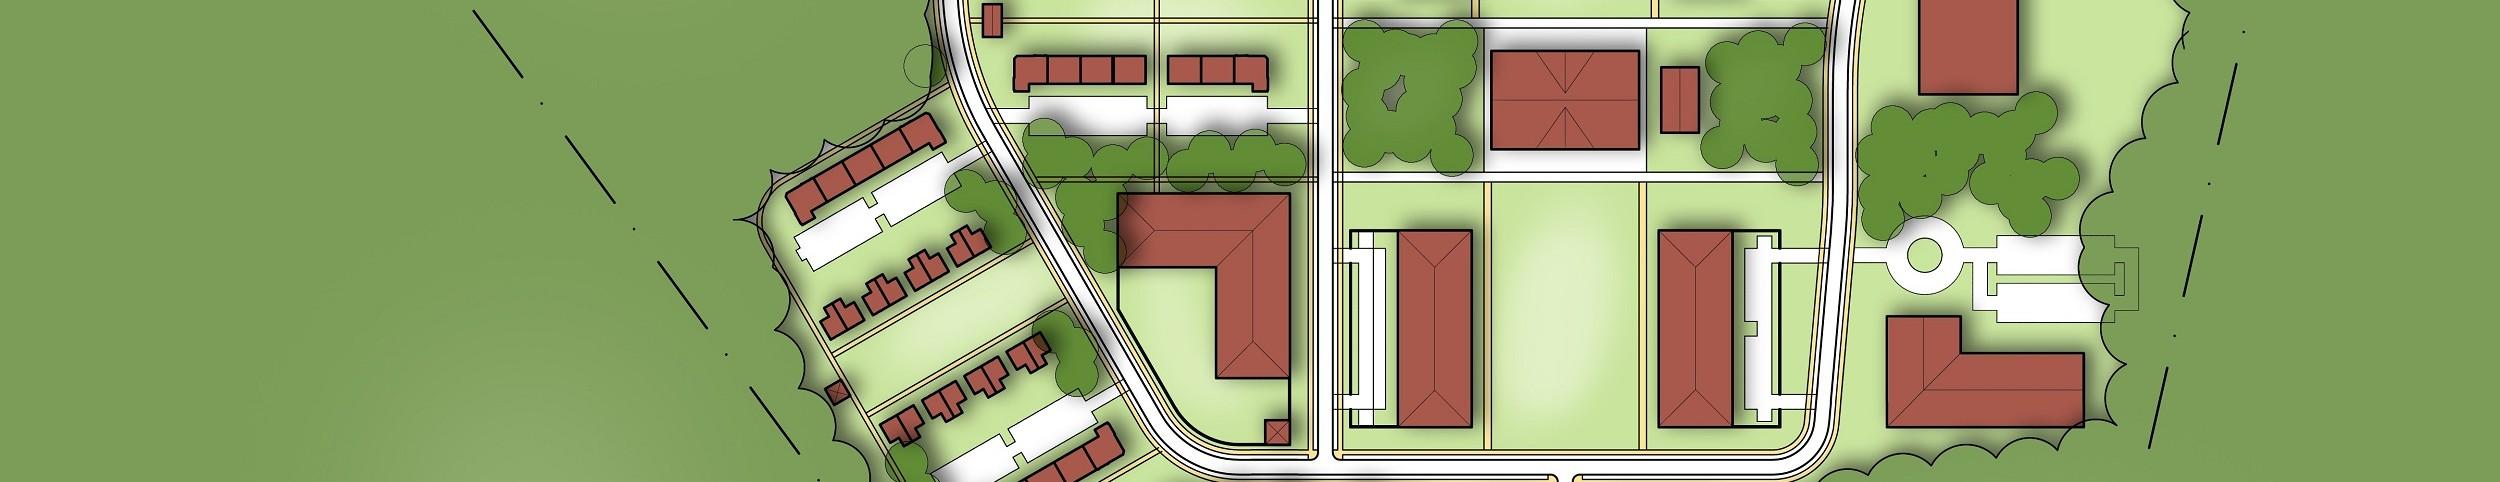 Proposed Beni American University - the header image